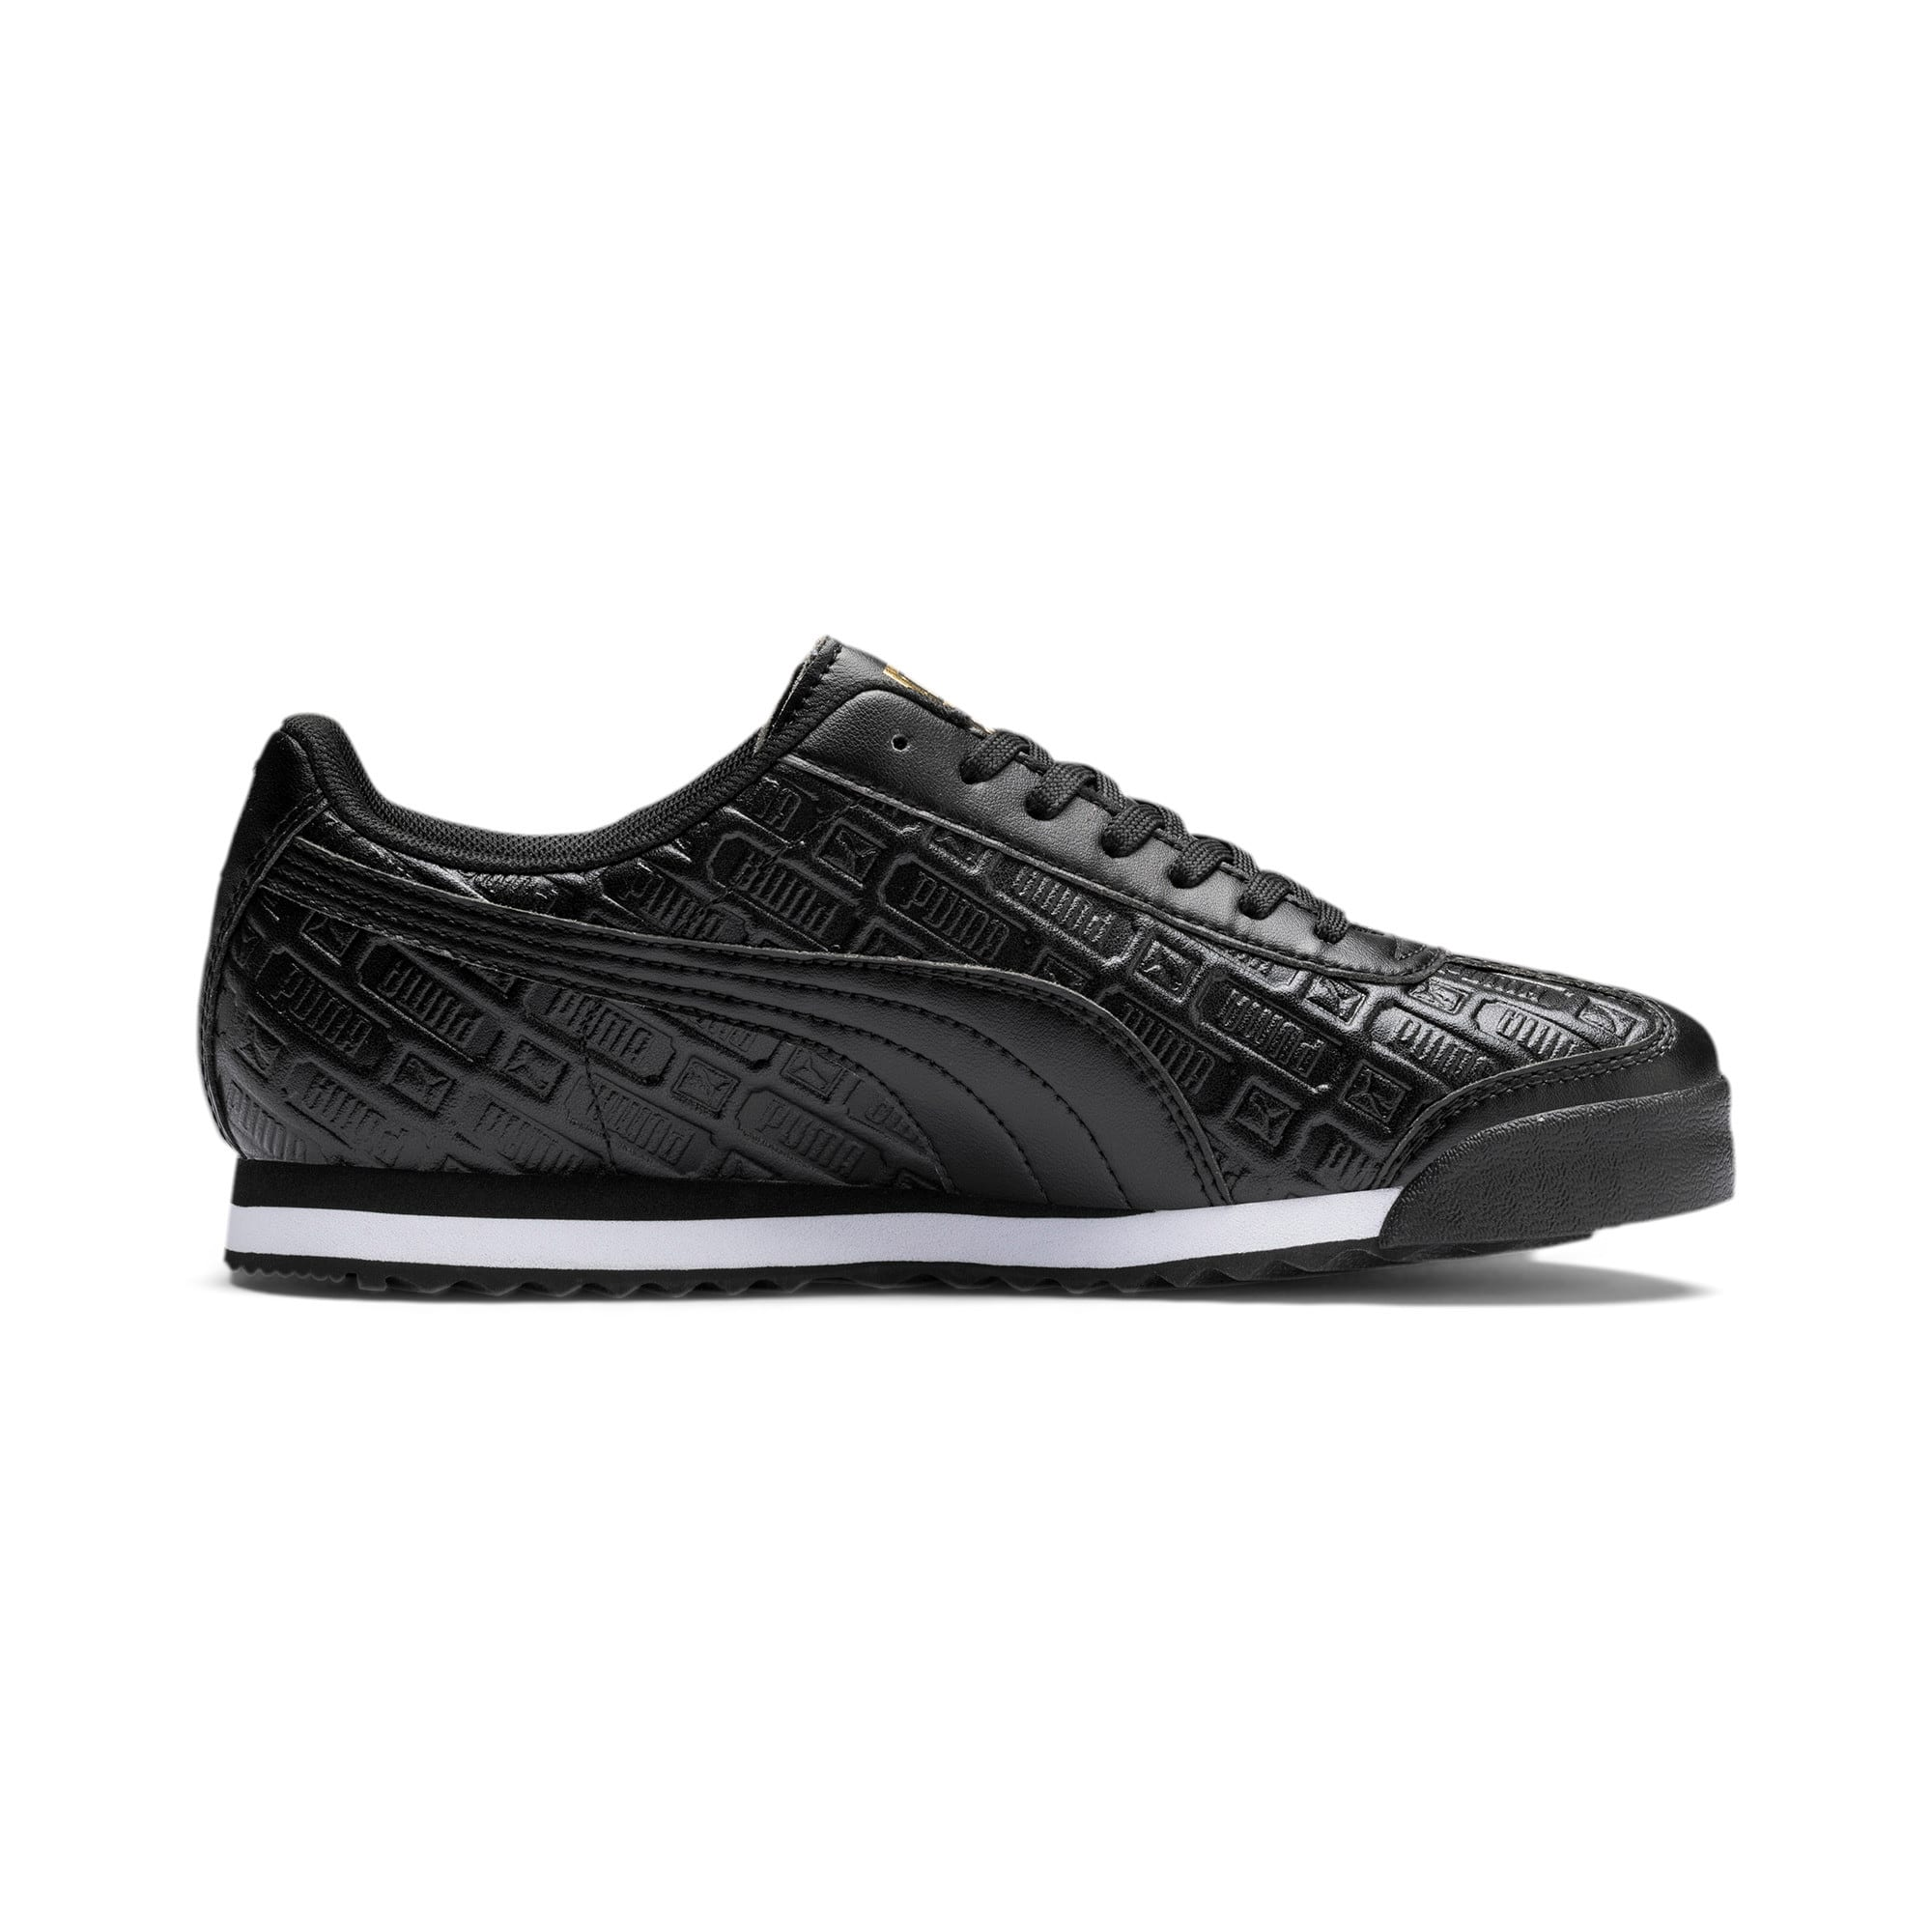 Thumbnail 6 of Roma Reinvent Women's Sneakers, Puma Black-Puma Team Gold, medium